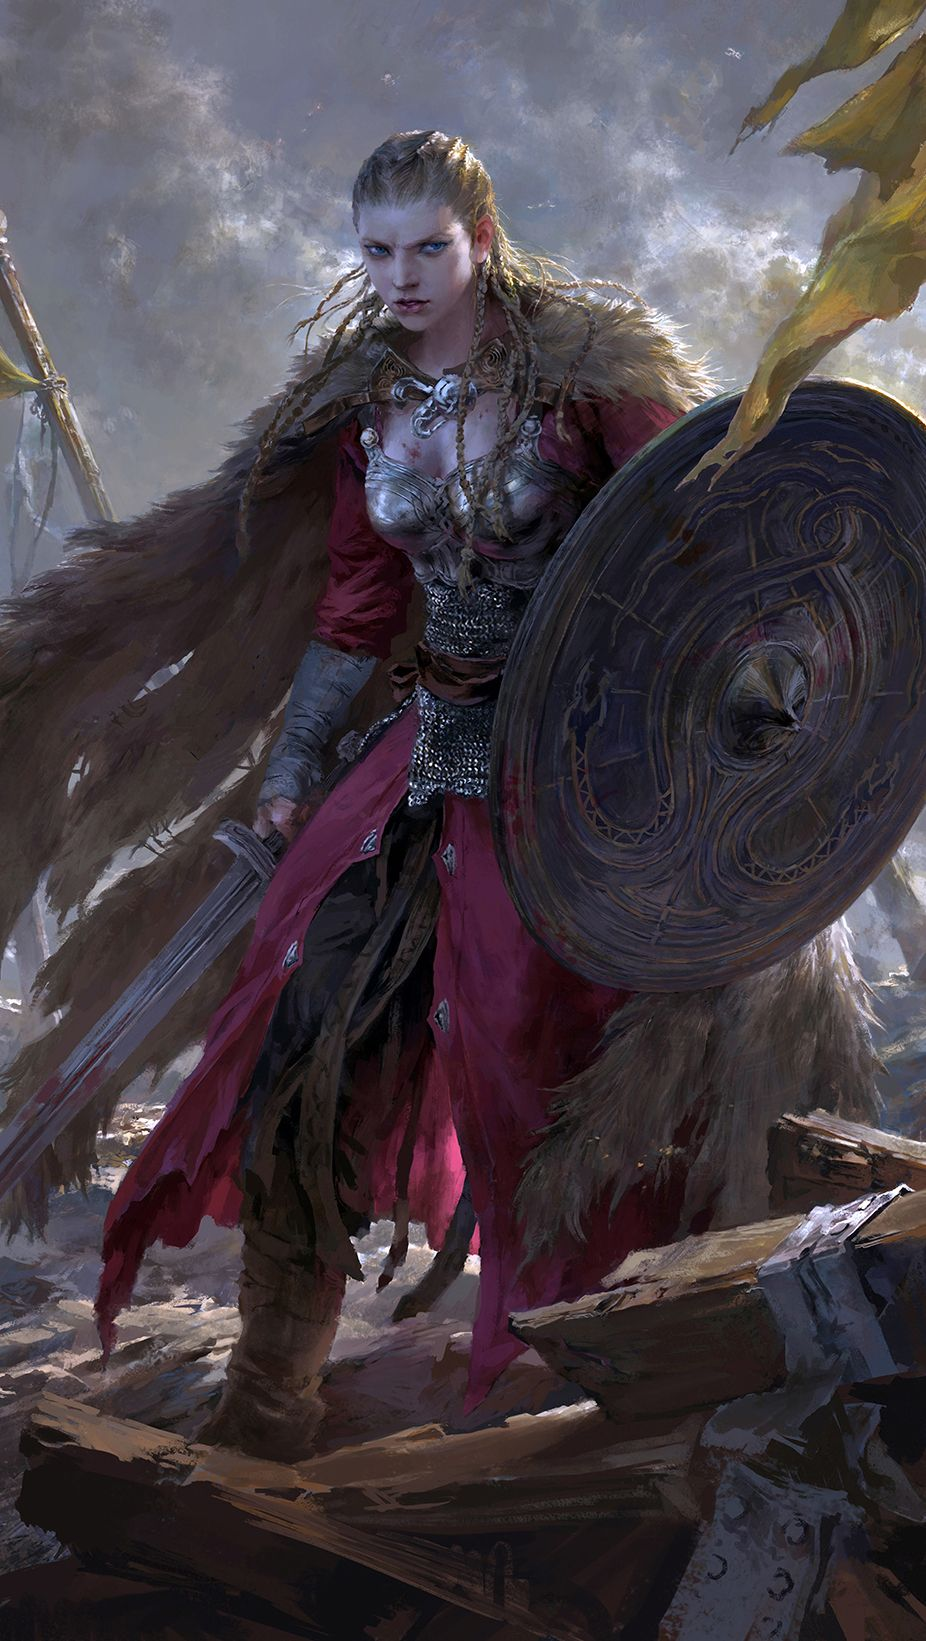 Brynhildr by flowerzzxu on deviantart detail faery - Fantasy female warrior artwork ...